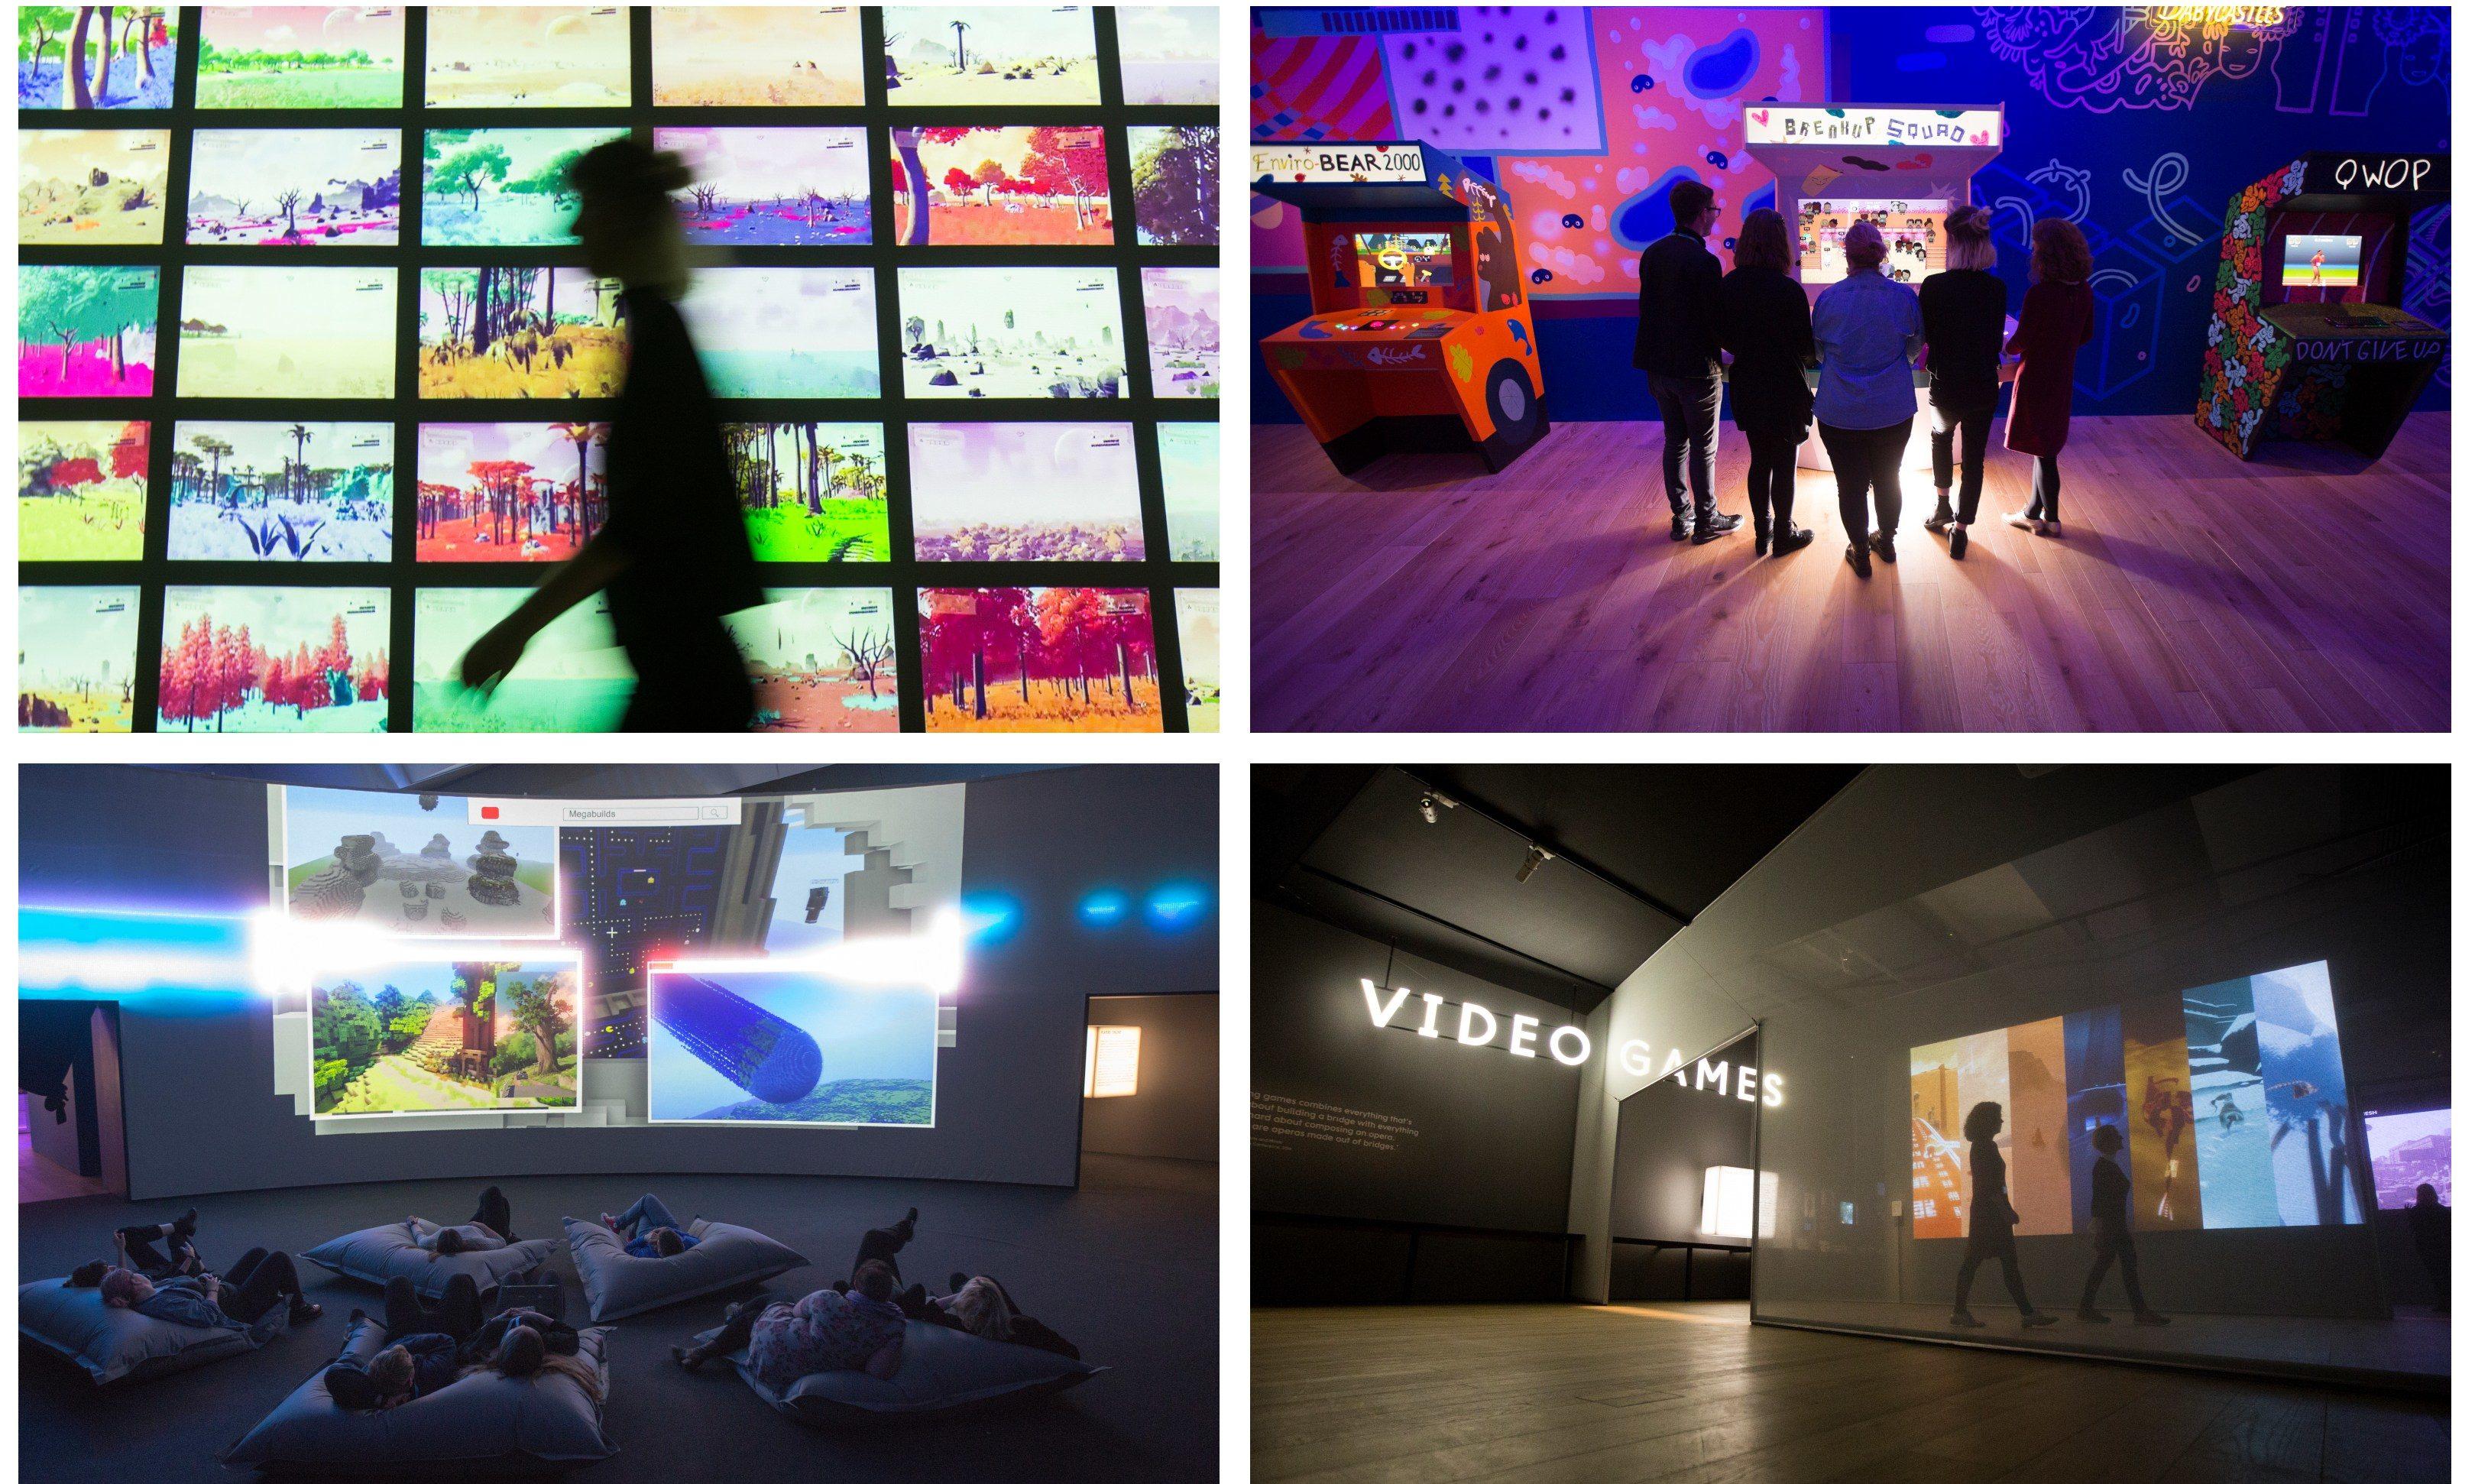 Videogames: Design/Play/Disrupt at VA Dundee last year